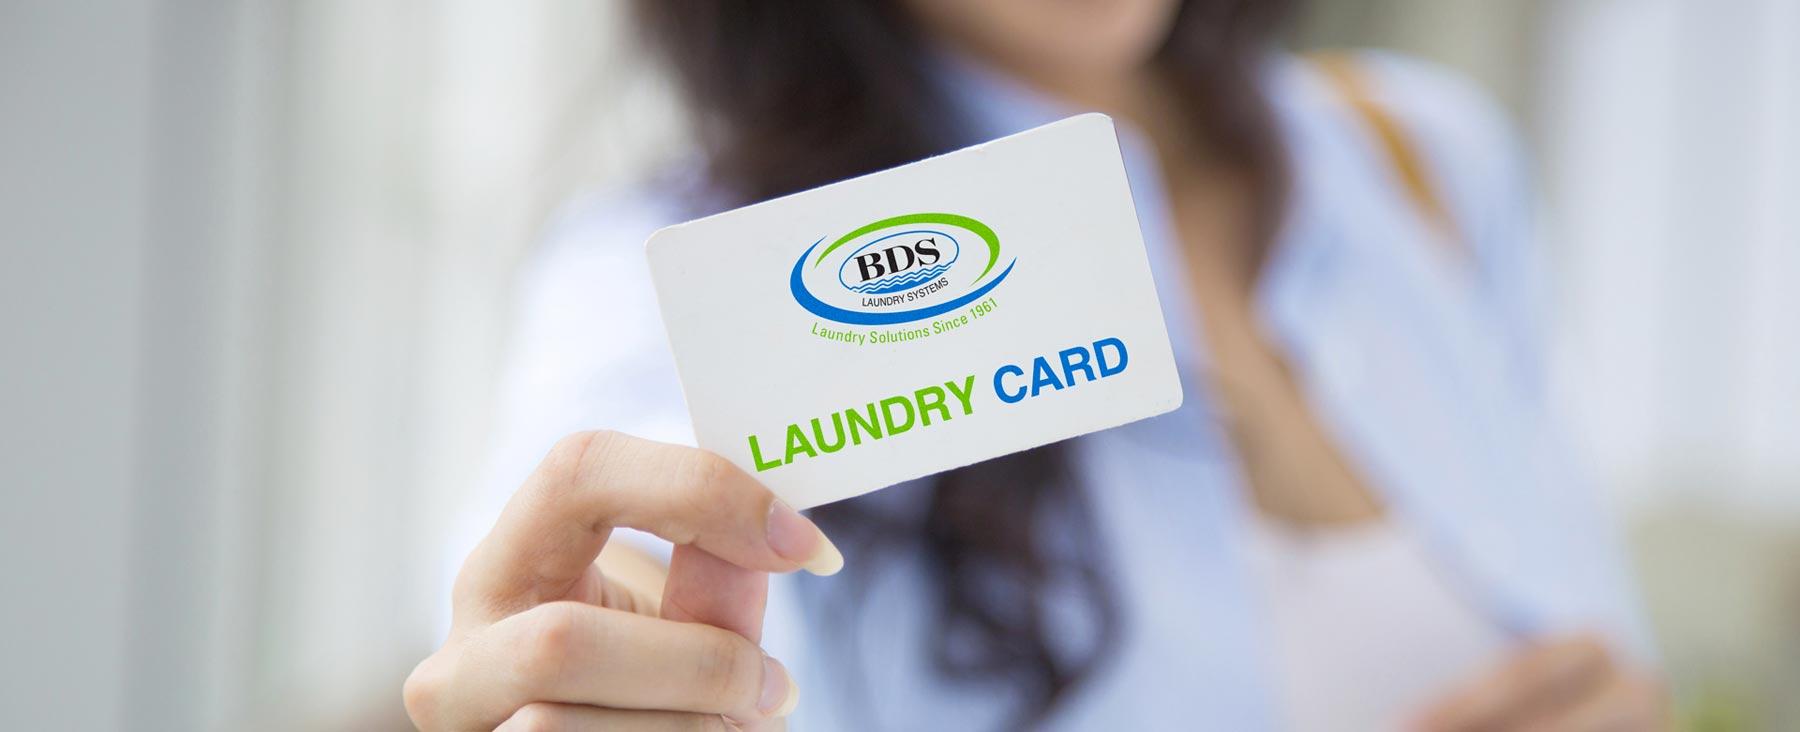 Header Laundry Card System Multihousing